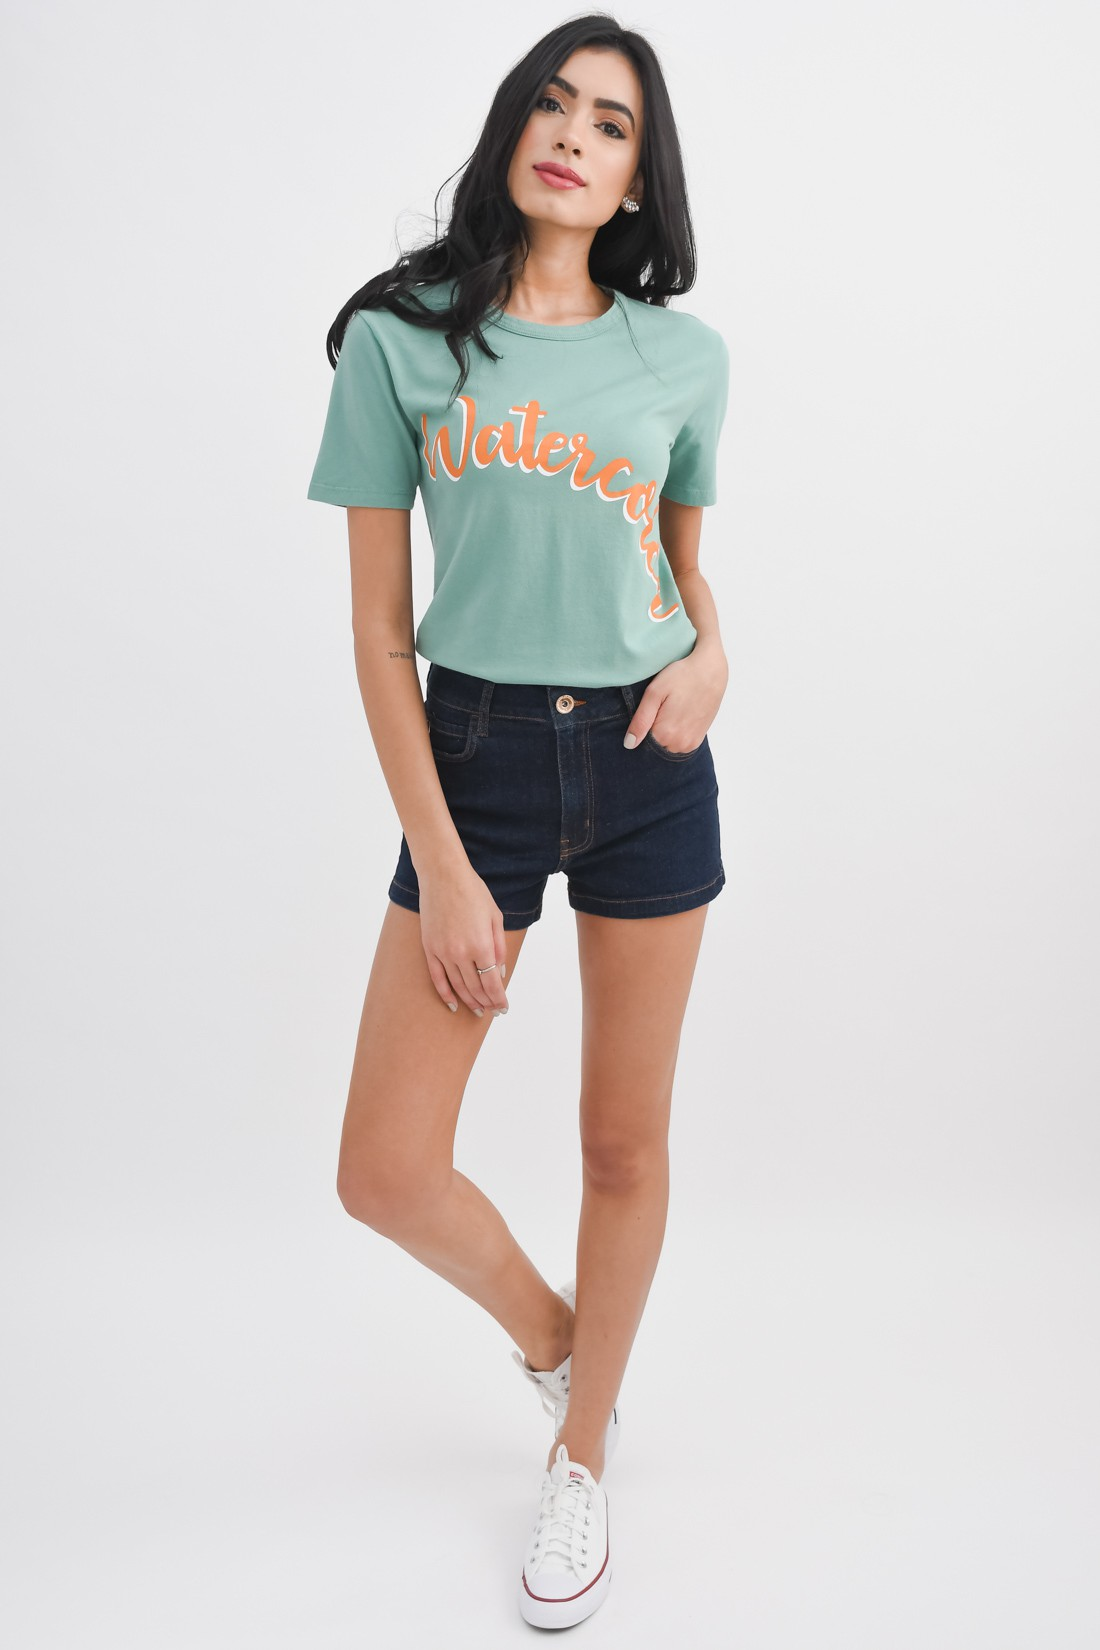 T Shirt Slywear Watercolor